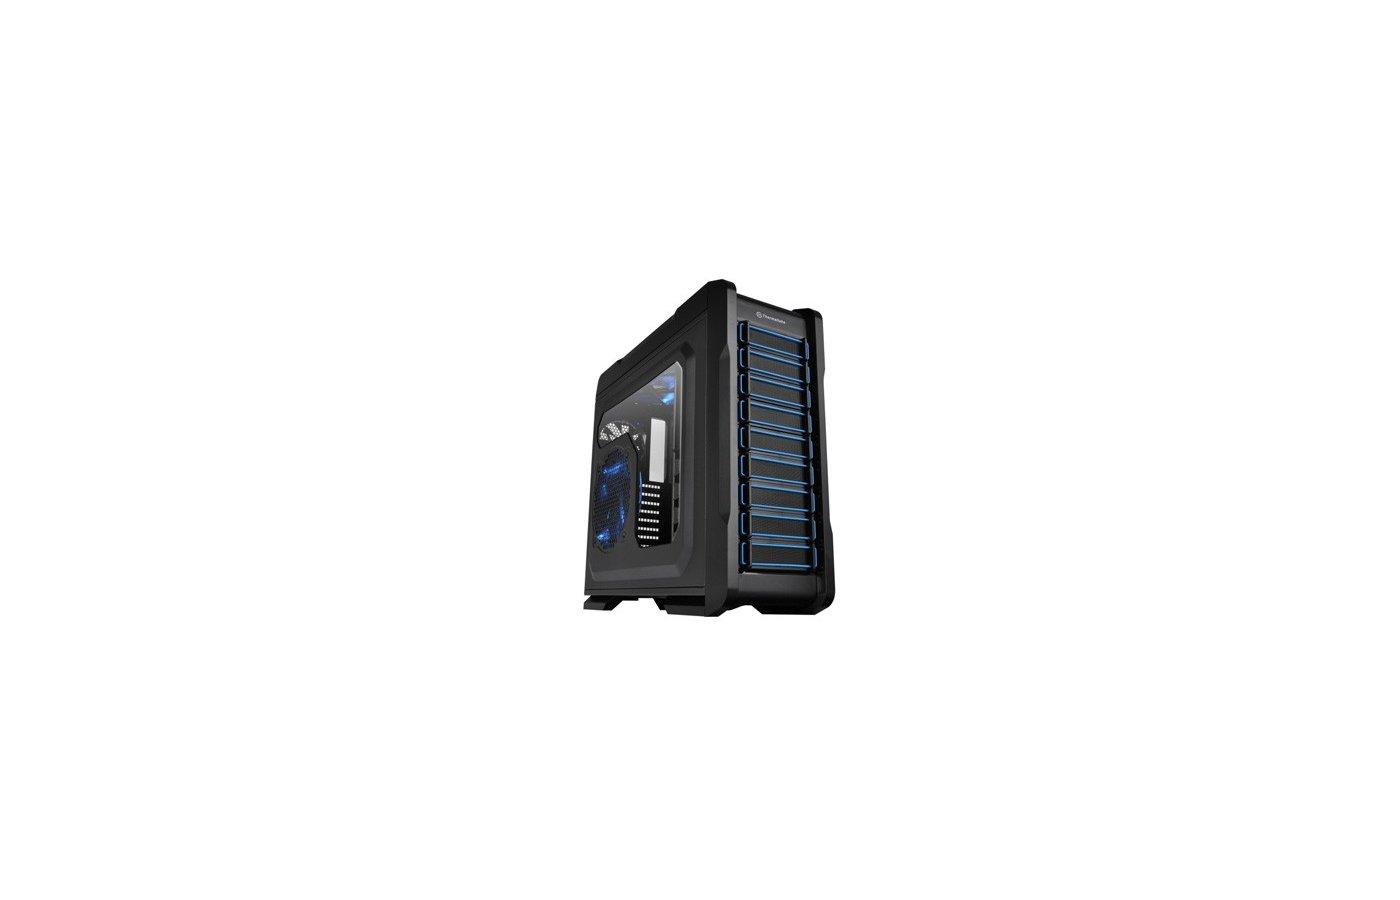 Корпус Thermaltake Chaser A71 черный без БП ATX 1x120mm 3x200mm 2xUSB2.0 2xUSB3.0 audio bott PSU